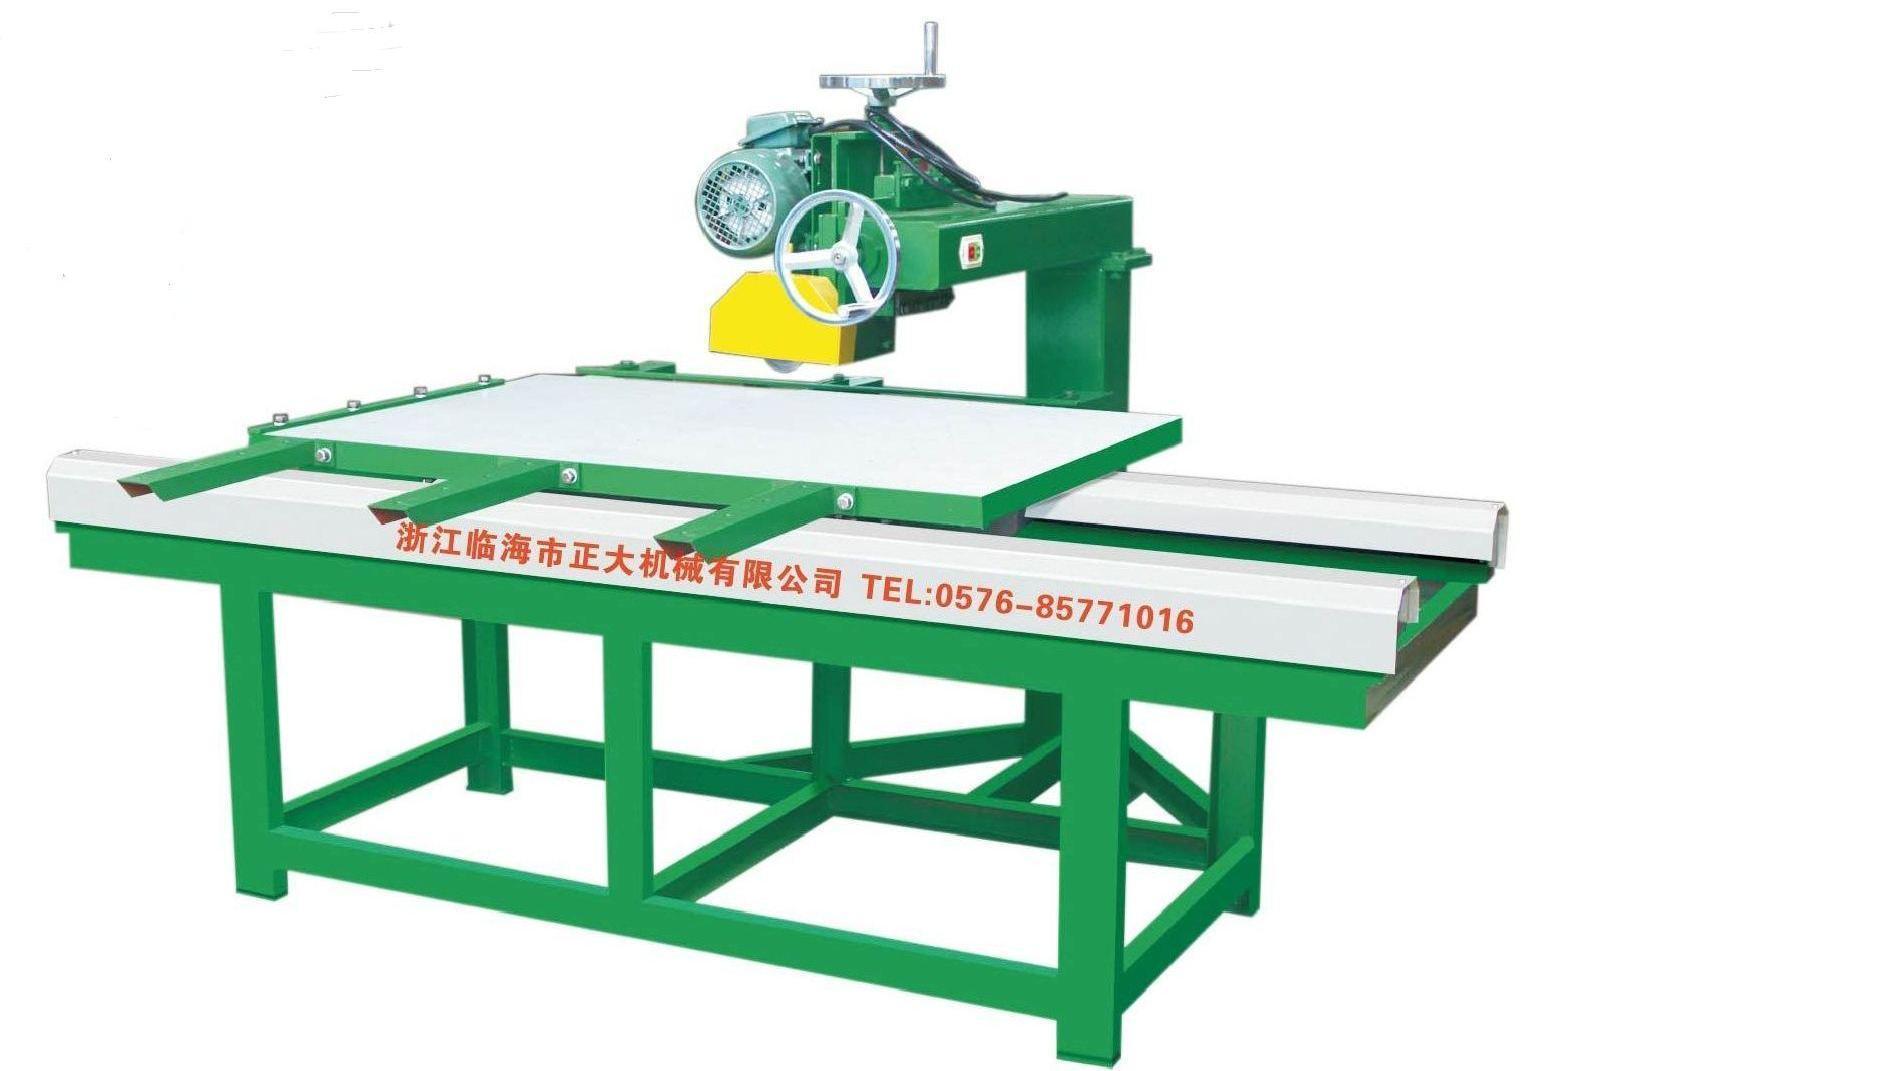 China Ceramic Tile Cutter Machine By Manual Zdc 1200 China